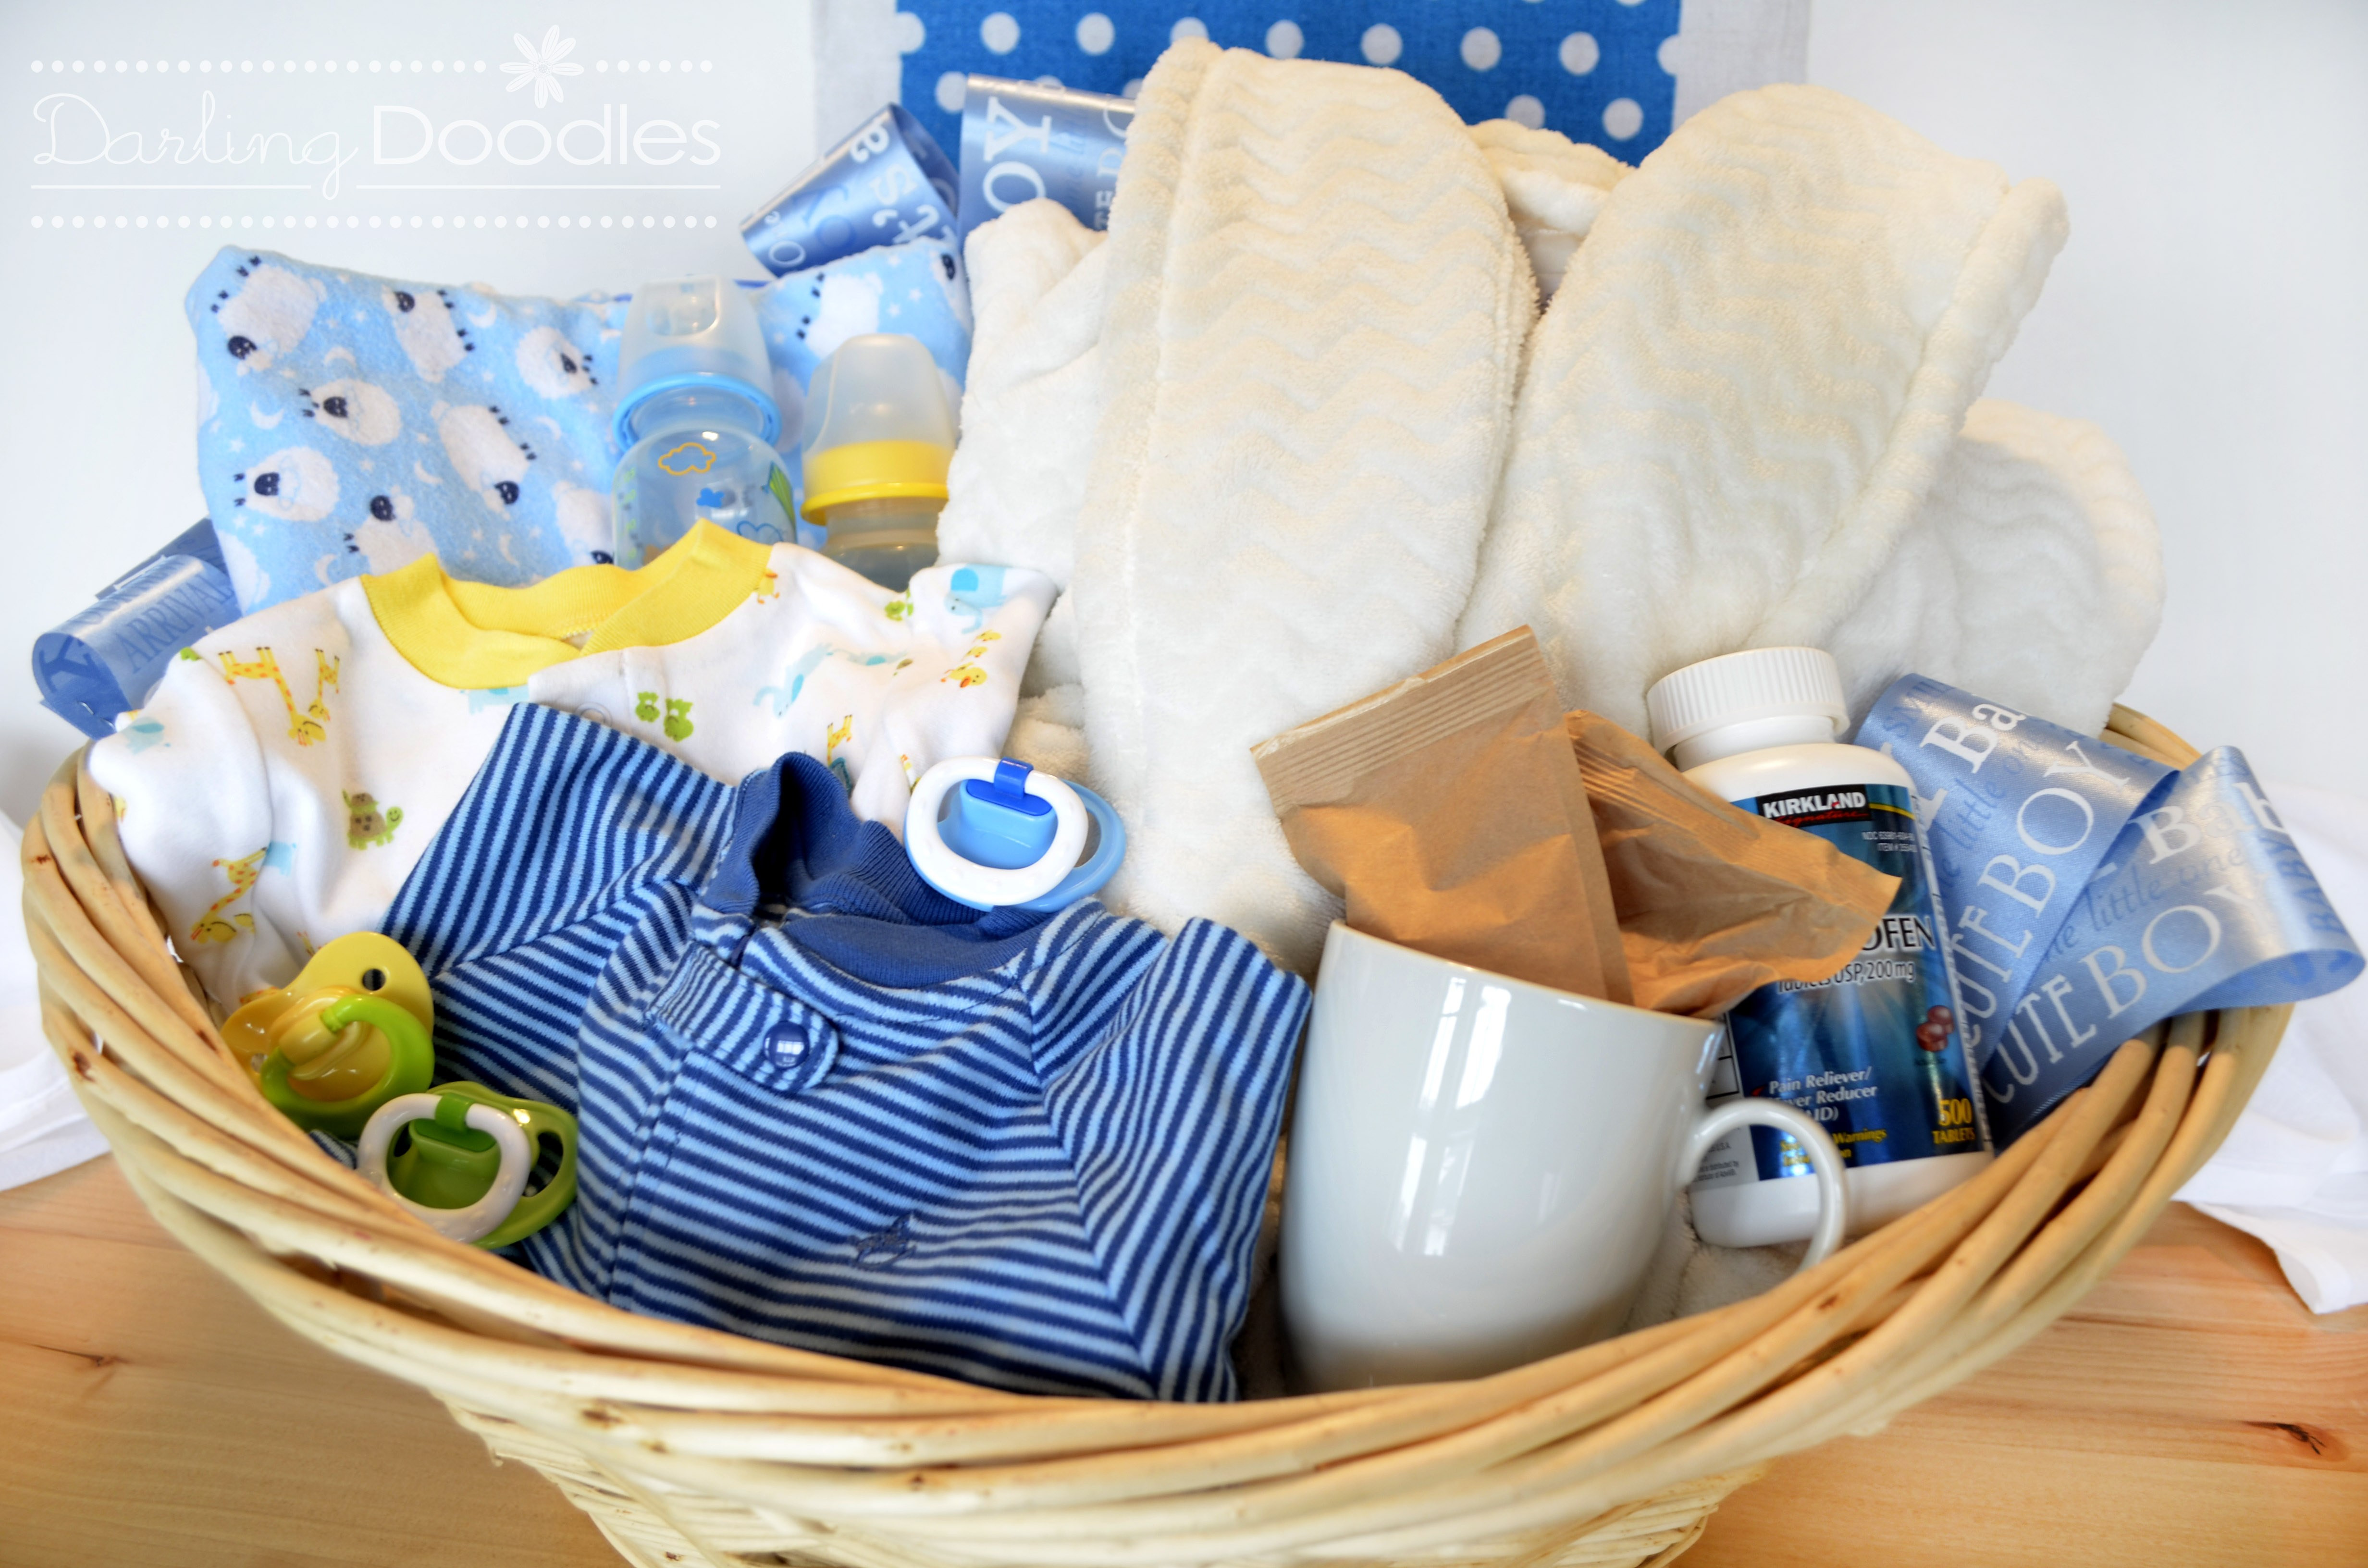 Gift Basket Ideas For Baby Shower  Up All Night Survival Kit Darling Doodles